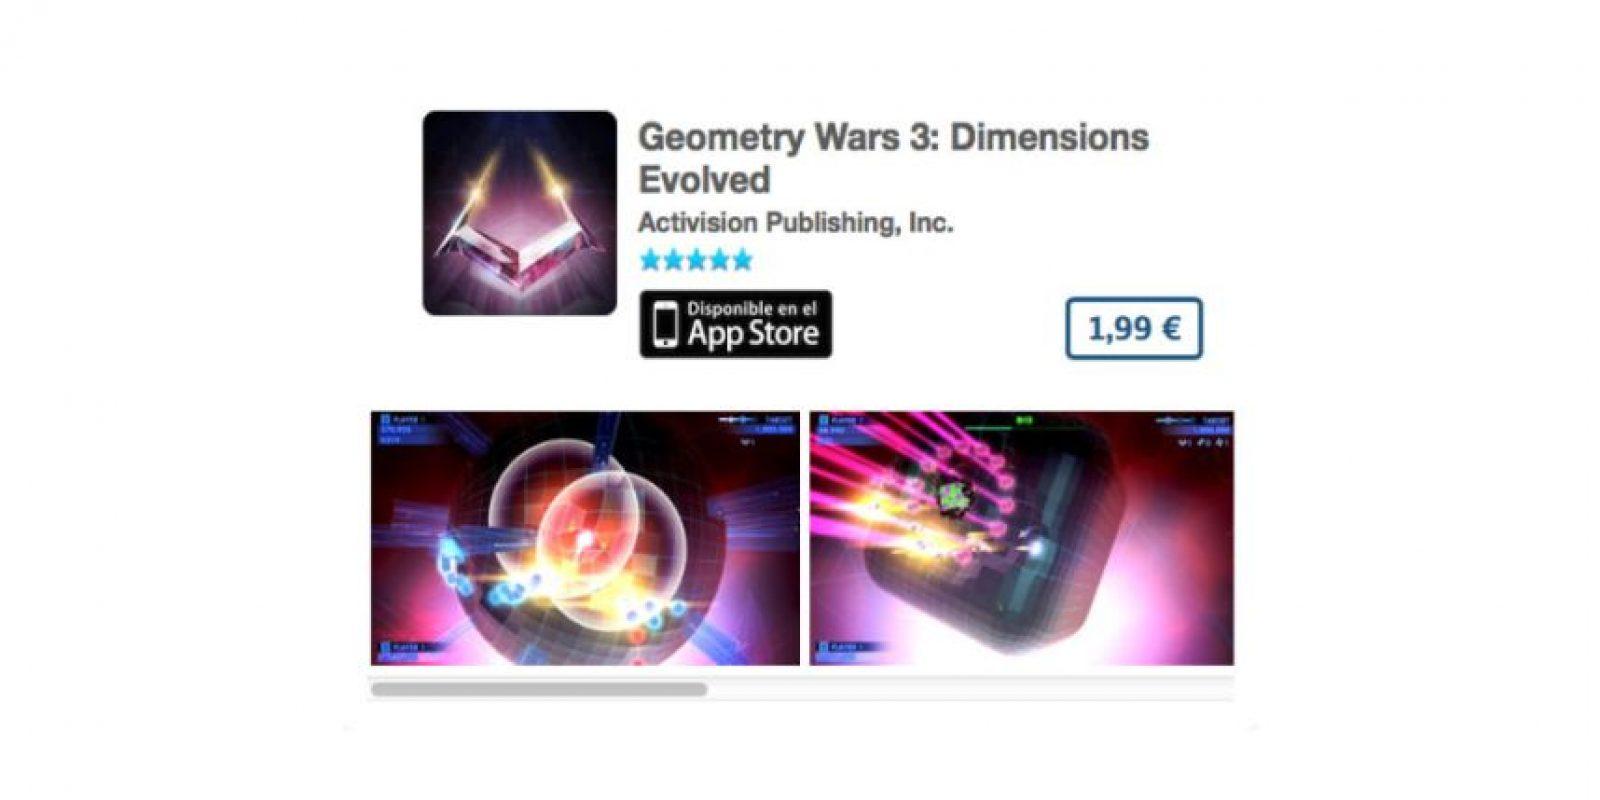 Geometry Wars 3: Dimensions Evolved es un ingenioso puzzle en 3D con gráficas impresionantes Foto:De Activision Publishing, Inc.